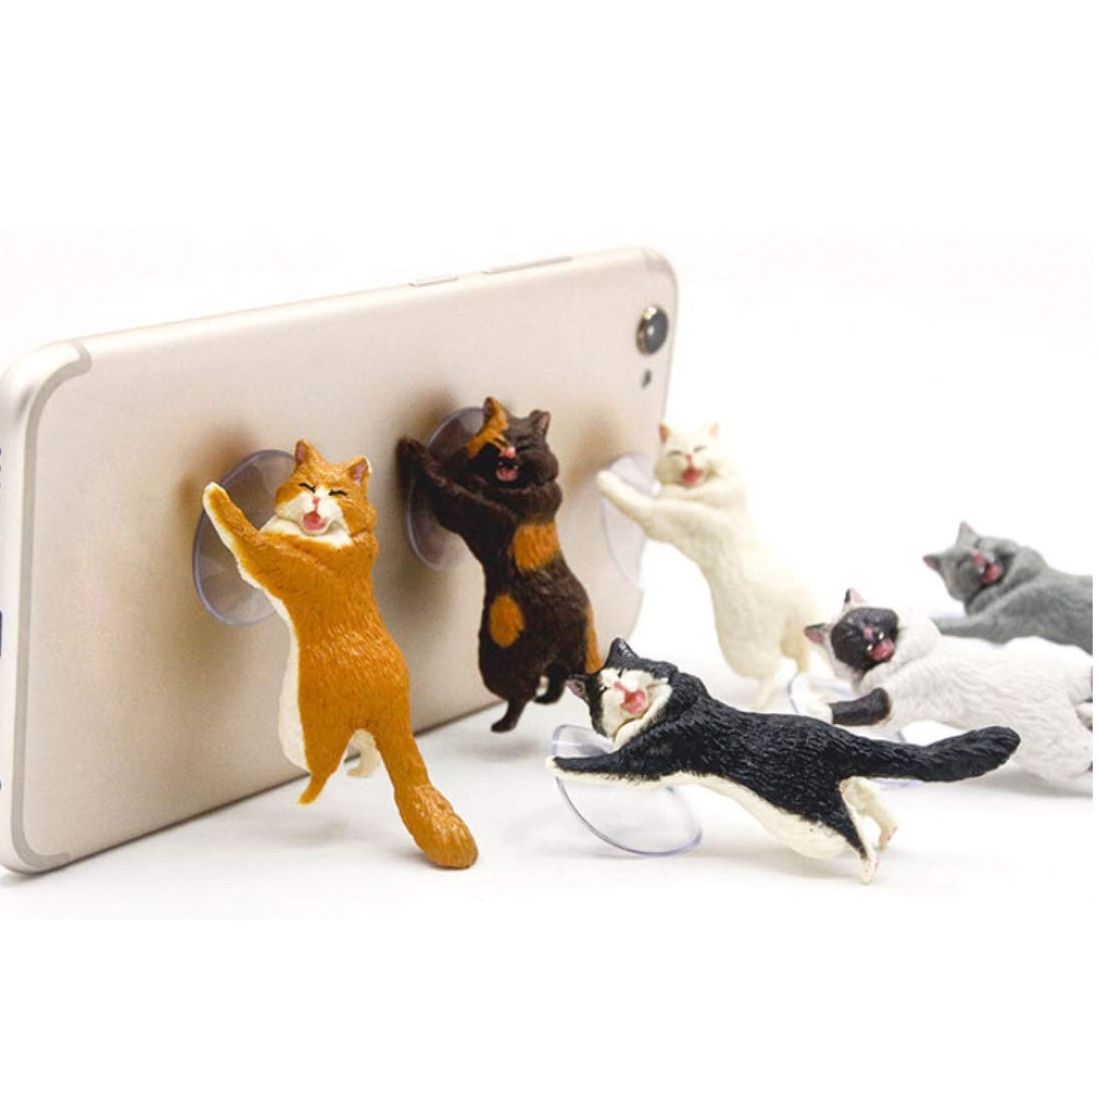 Mobile Phone Stand Holder Cute Cat Support  Smartphone Stand Stand Sucker Tablets Desk Sucker Design